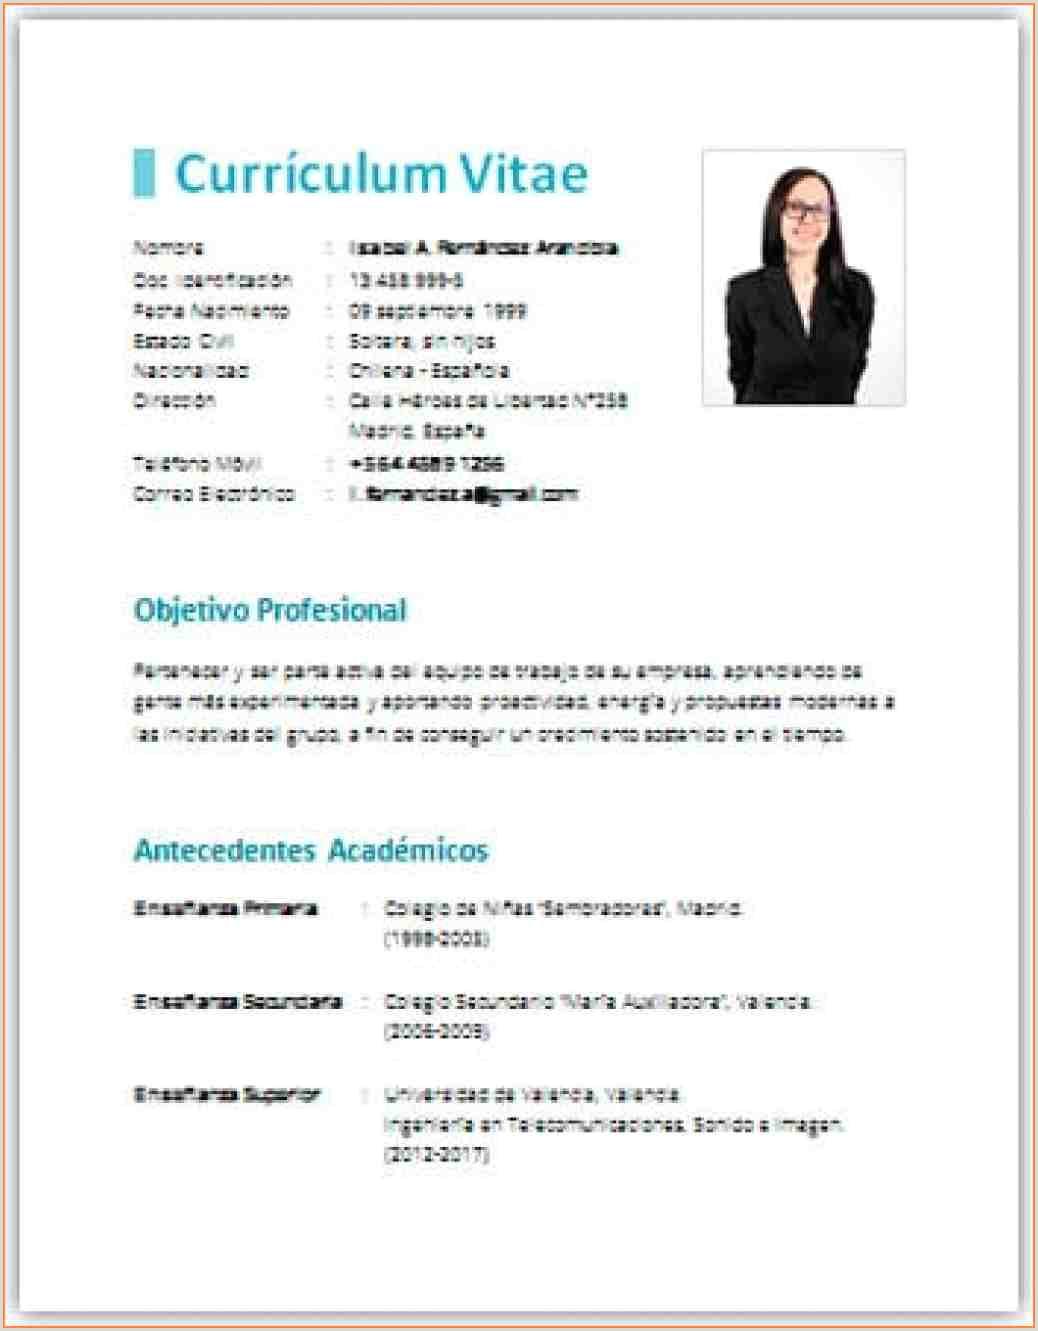 Curriculum Vitae Plantilla Para Rellenar E Imprimir by Congress Curriculum Vitae Plantilla Para